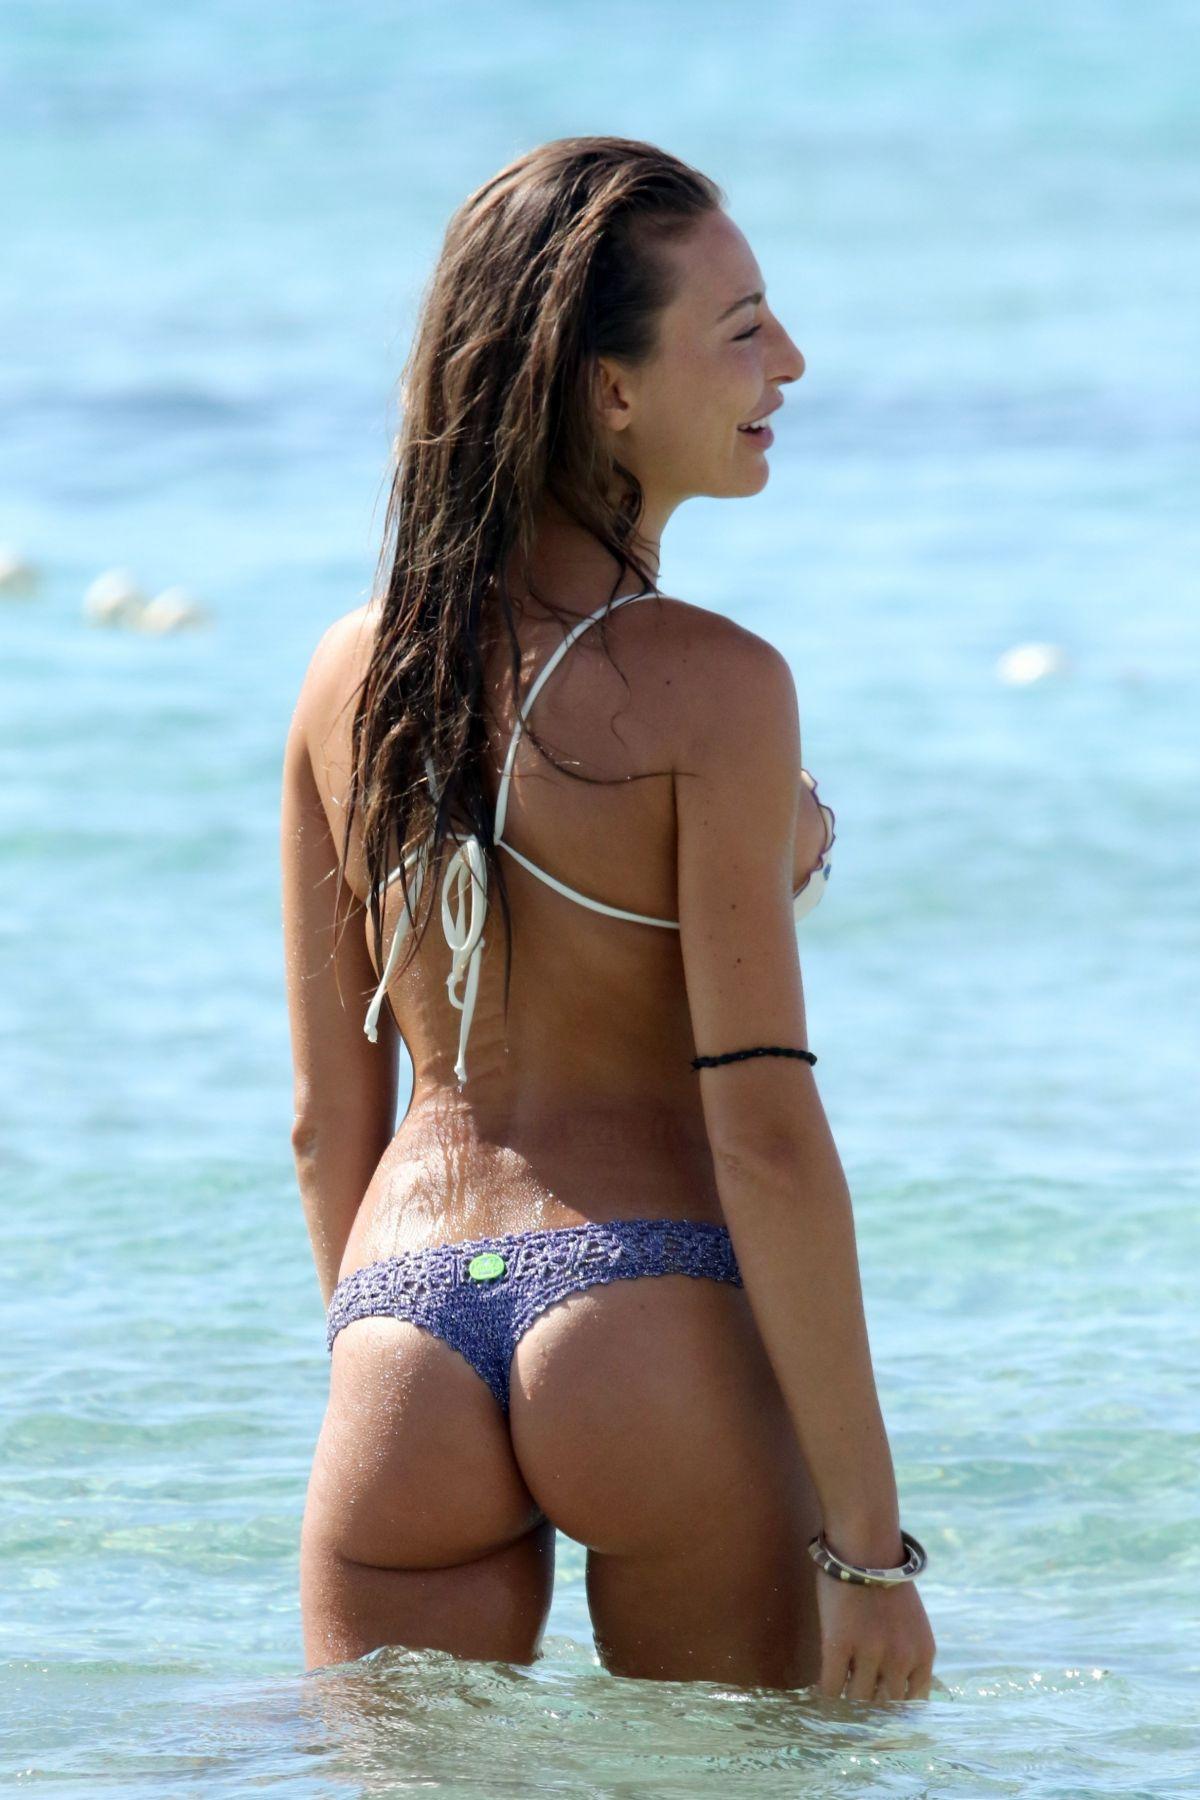 Photos Alessia Tedeschi nudes (14 foto and video), Pussy, Bikini, Selfie, bra 2018